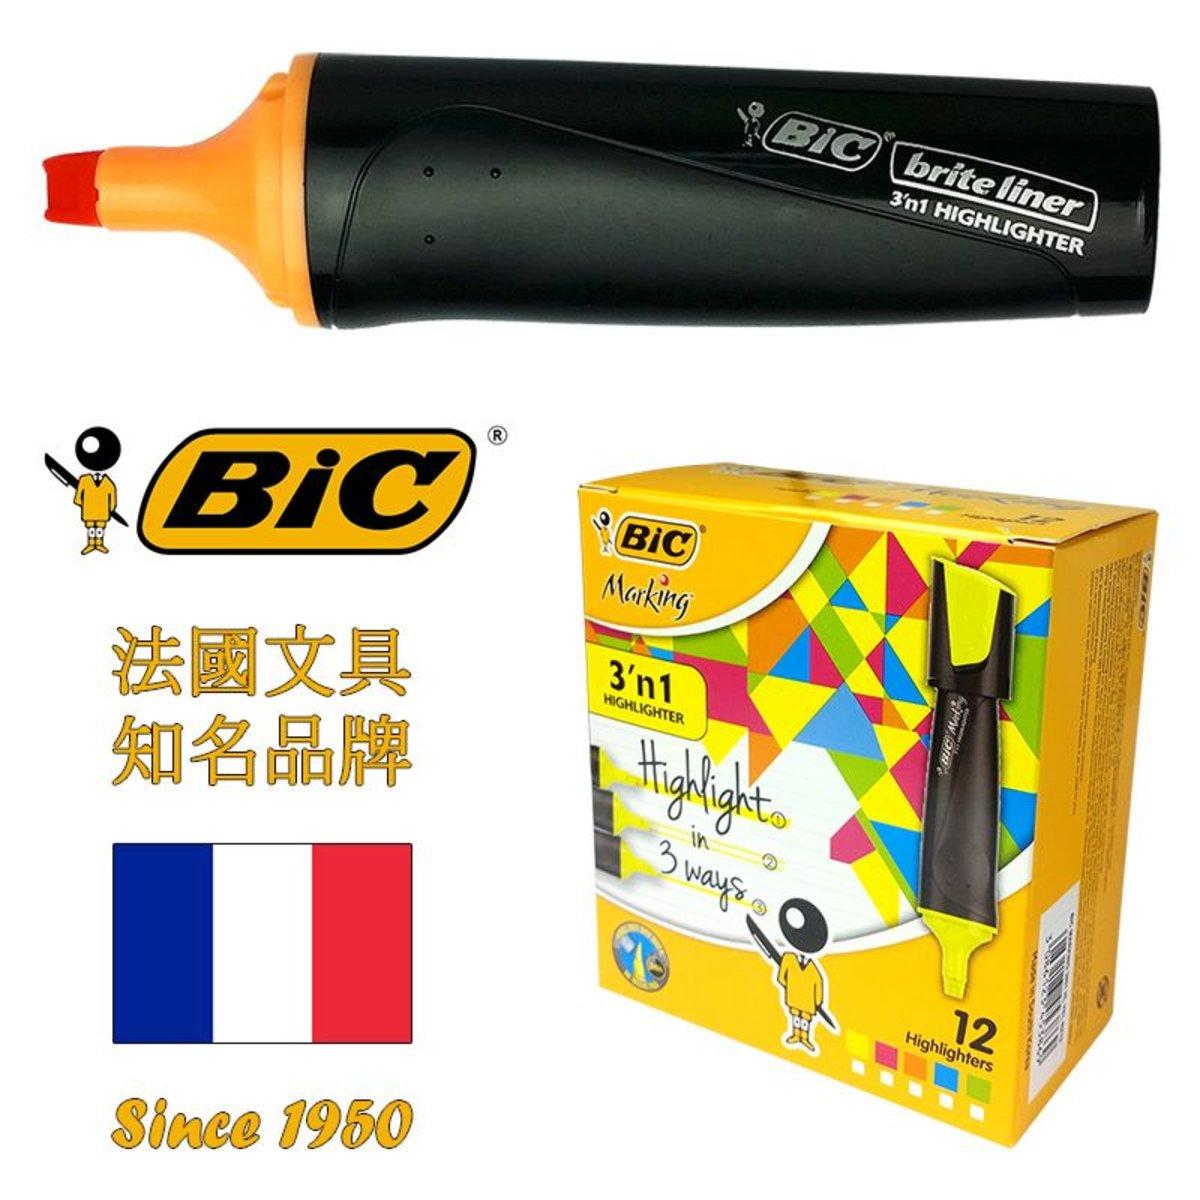 Marking 3 in 1 Highlighter Pen – Orange (Made in Korea) | 12 pcs/box